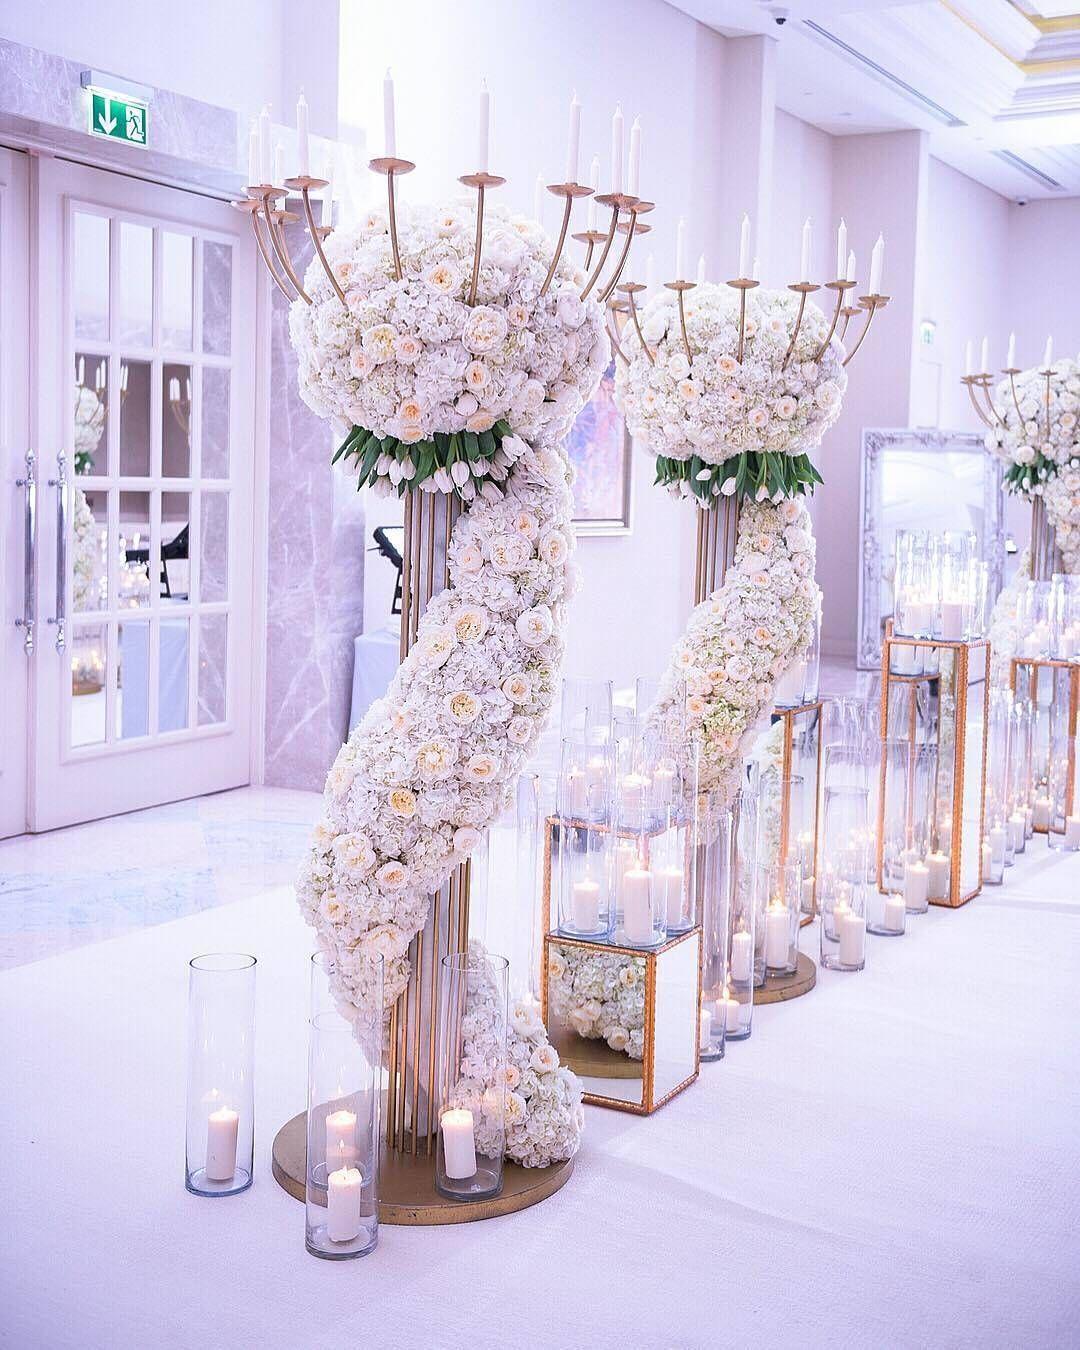 Wedding decorations nigeria october 2018 Pin by Sharon Whitney on weddings in   Pinterest  Wedding